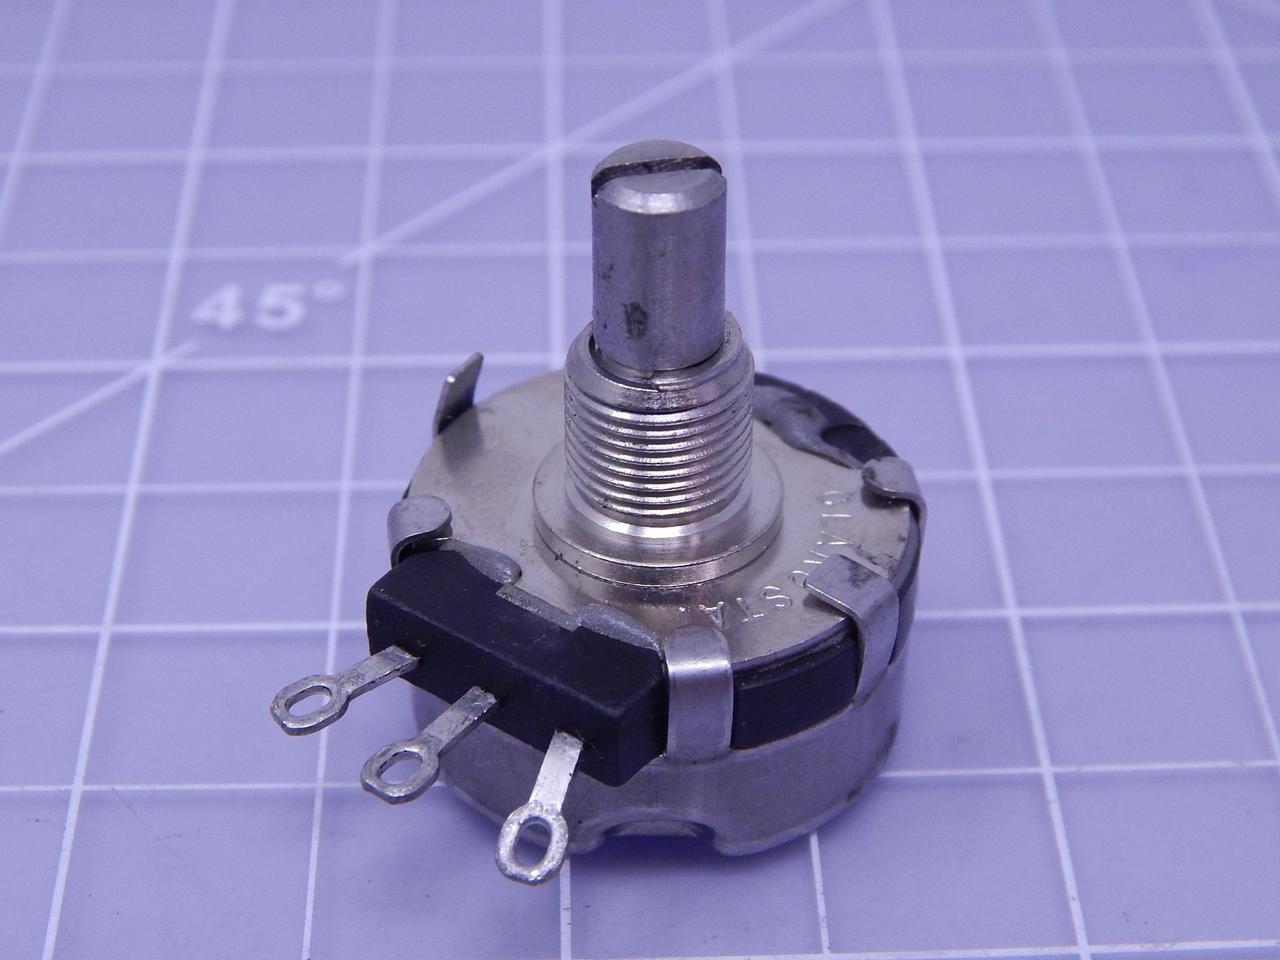 Clarostat 11036015 Potentiometer 200 Ohms T122022 Test Equipment Wiring For Sale